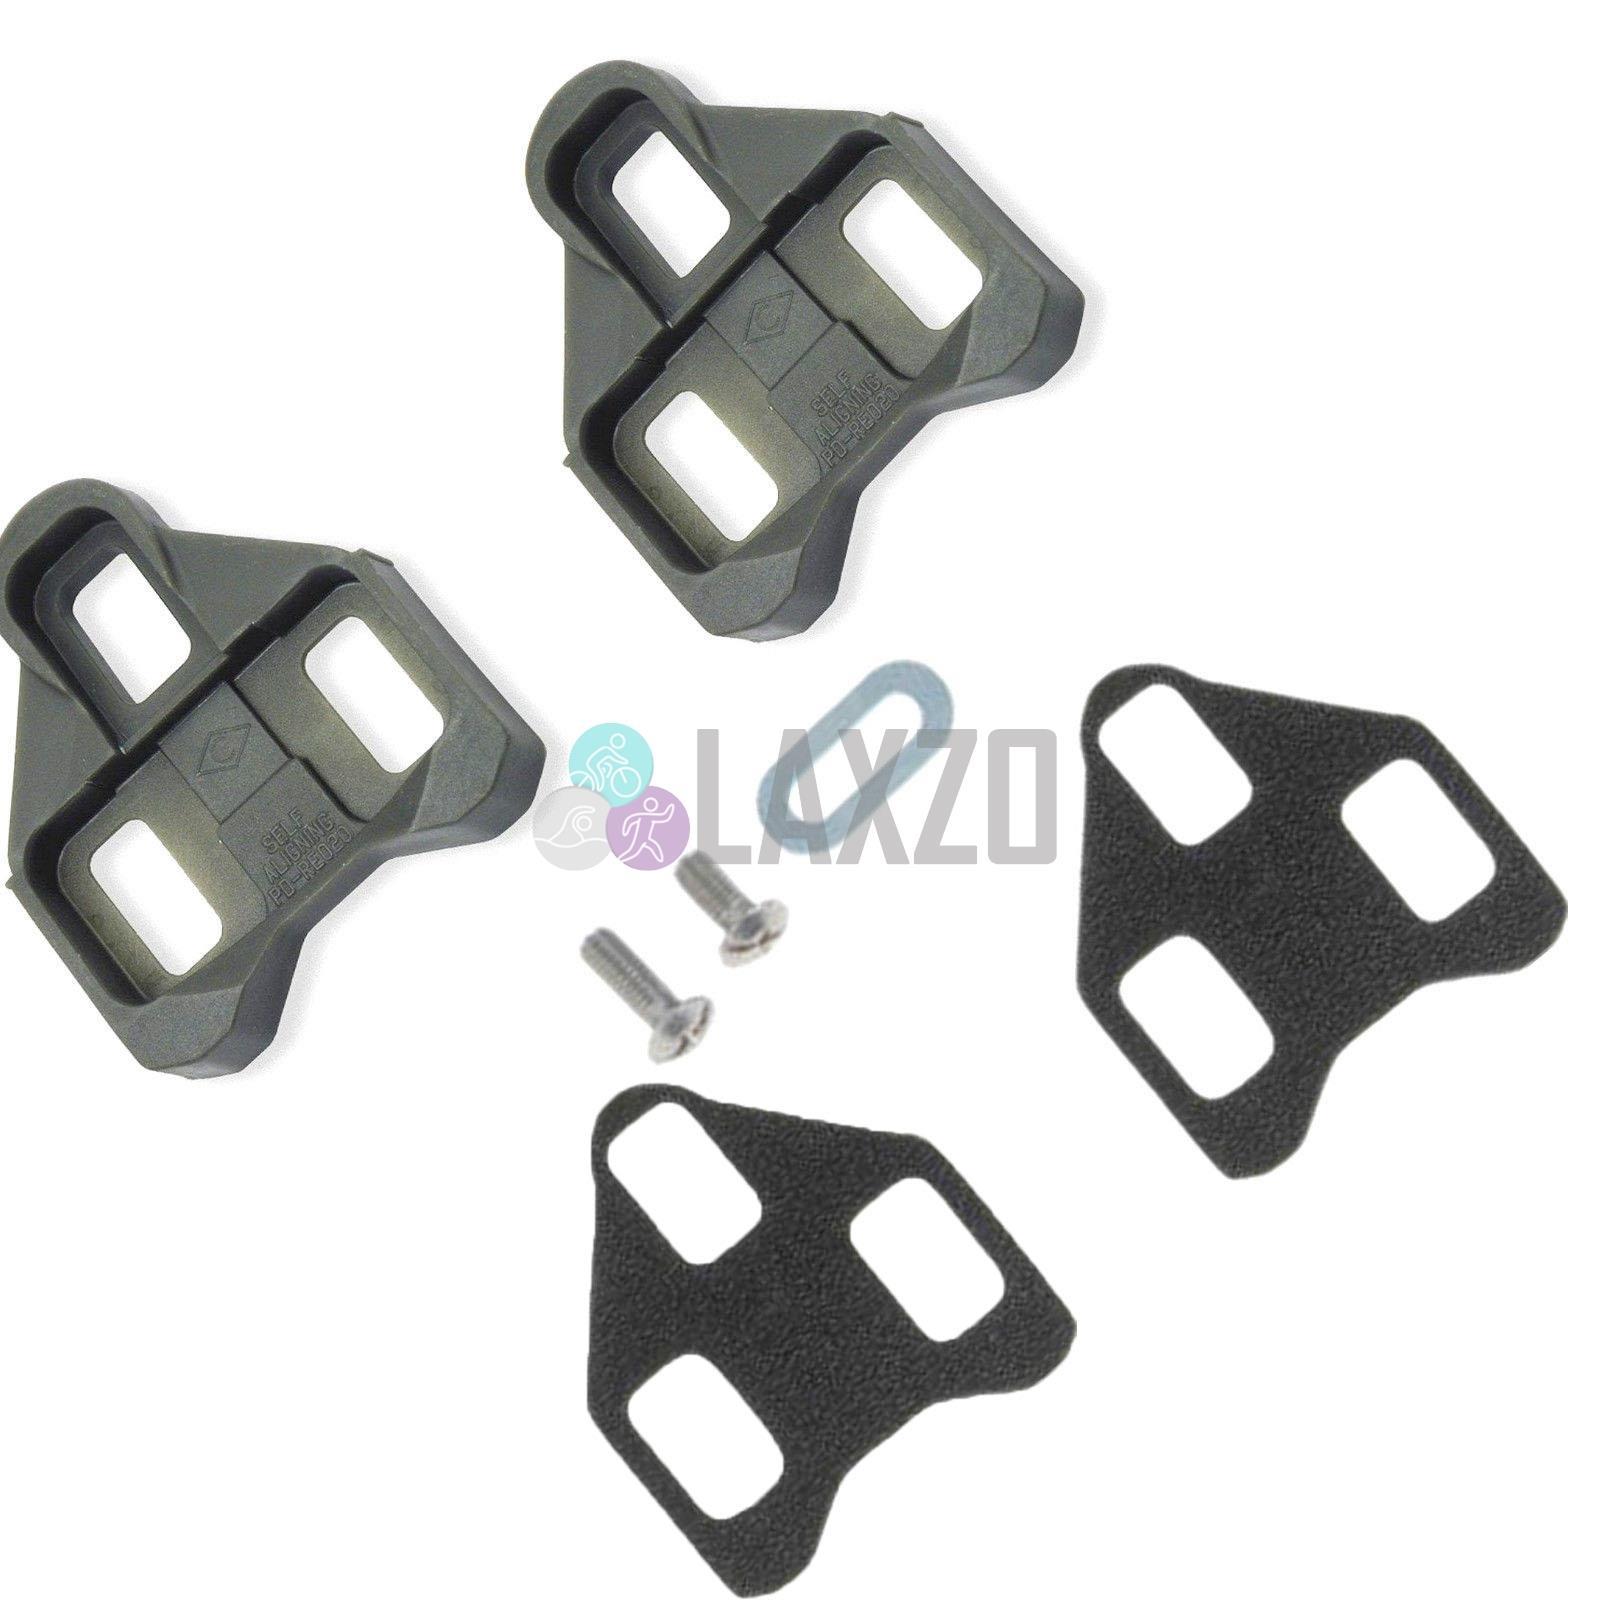 Campagnolo Pedale  PD-RE020 R1134572 Cleats mit Spiel schwarz